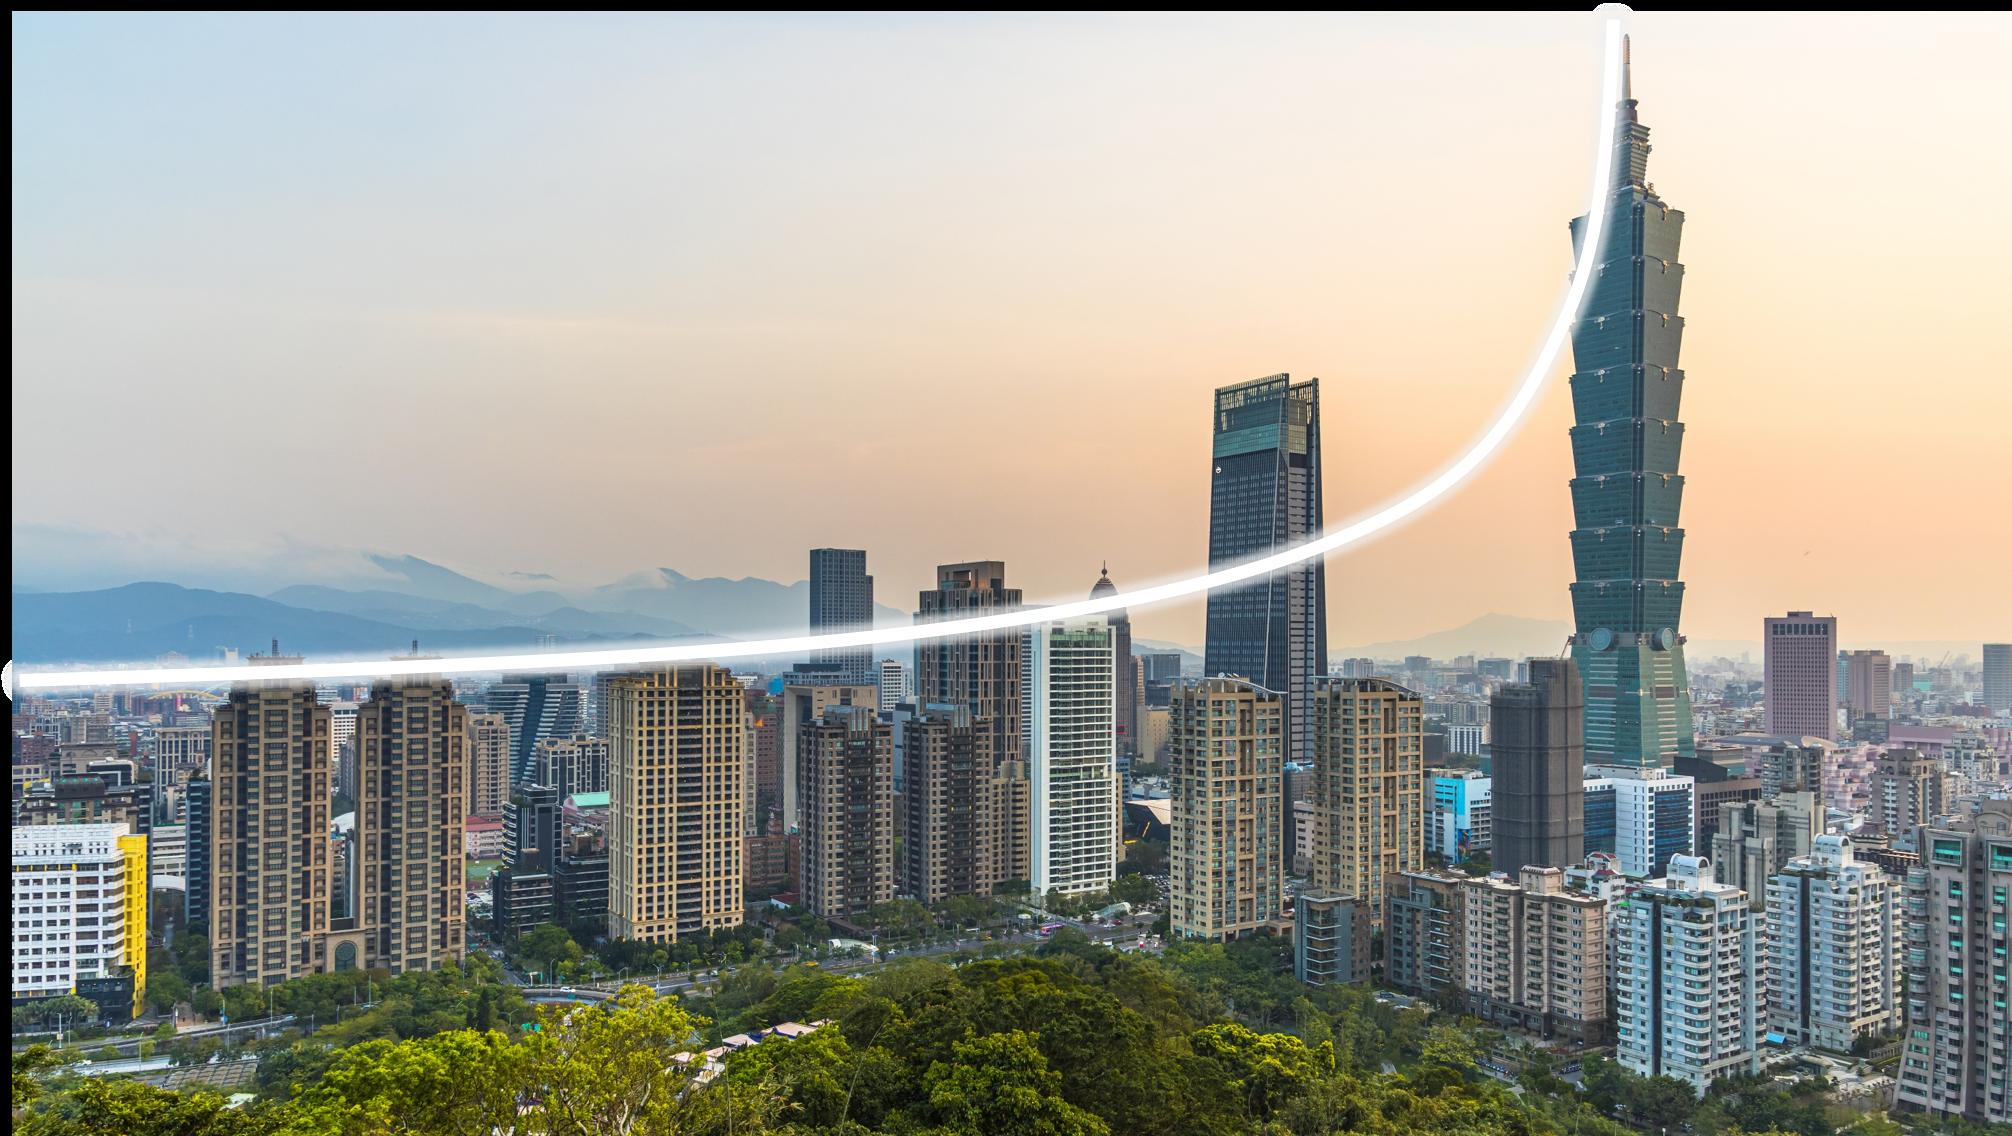 Taipei exponential